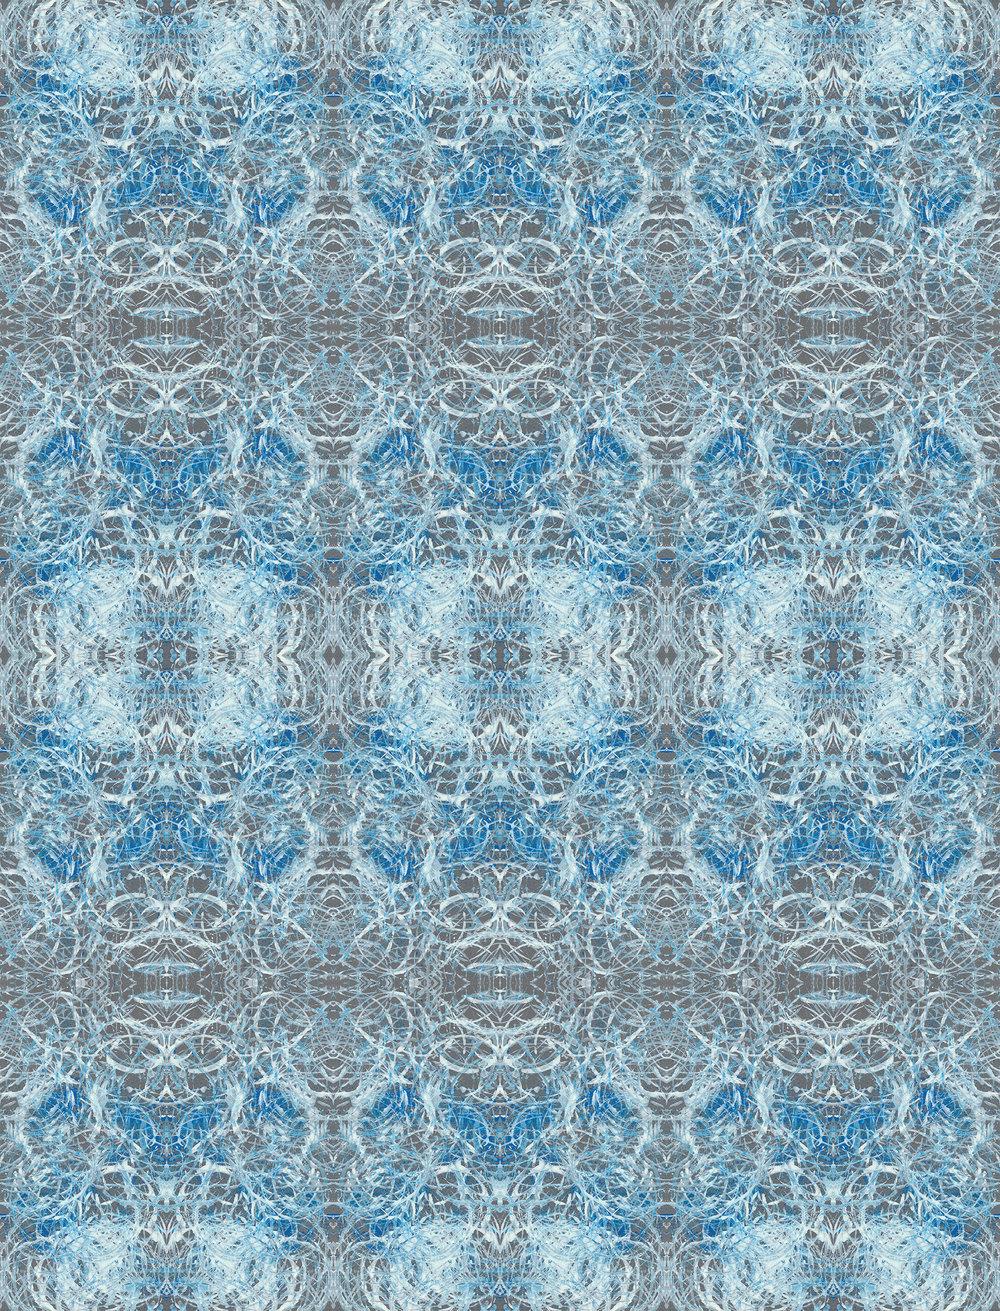 pattern3-patternrepeat150.jpg